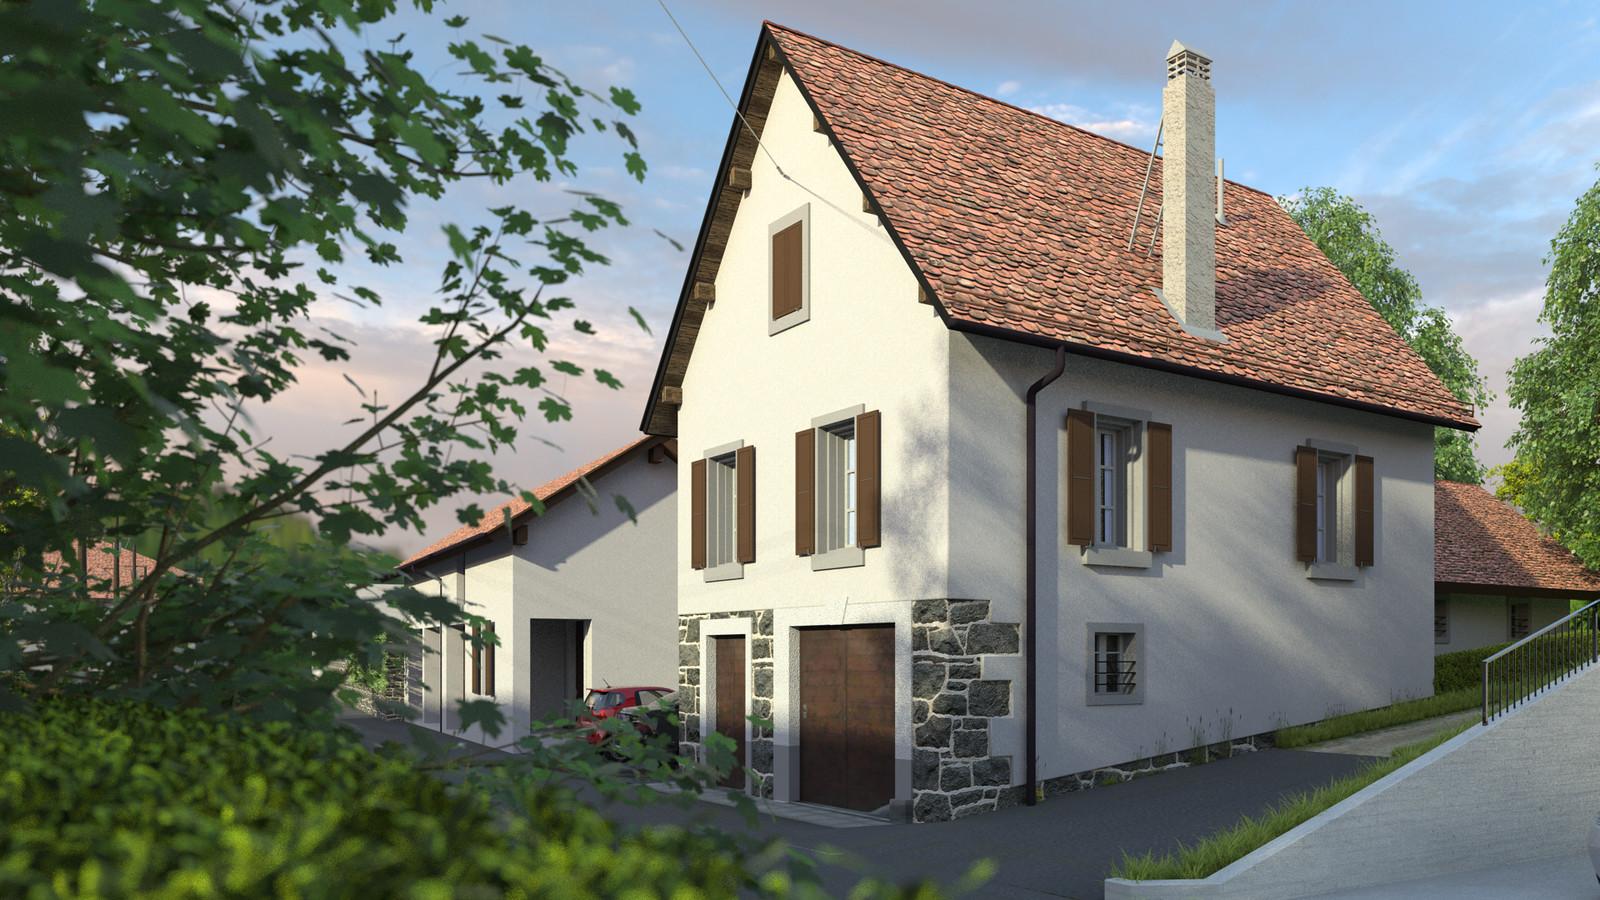 SketchUp + Thea Render  Little Swiss House Scene 28 161-hdri-skies 01 HD 1920 x 1080 Presto MC  HDR by HDRI-SKIES found here: http://hdri-skies.com/shop/hdri-sky-161/